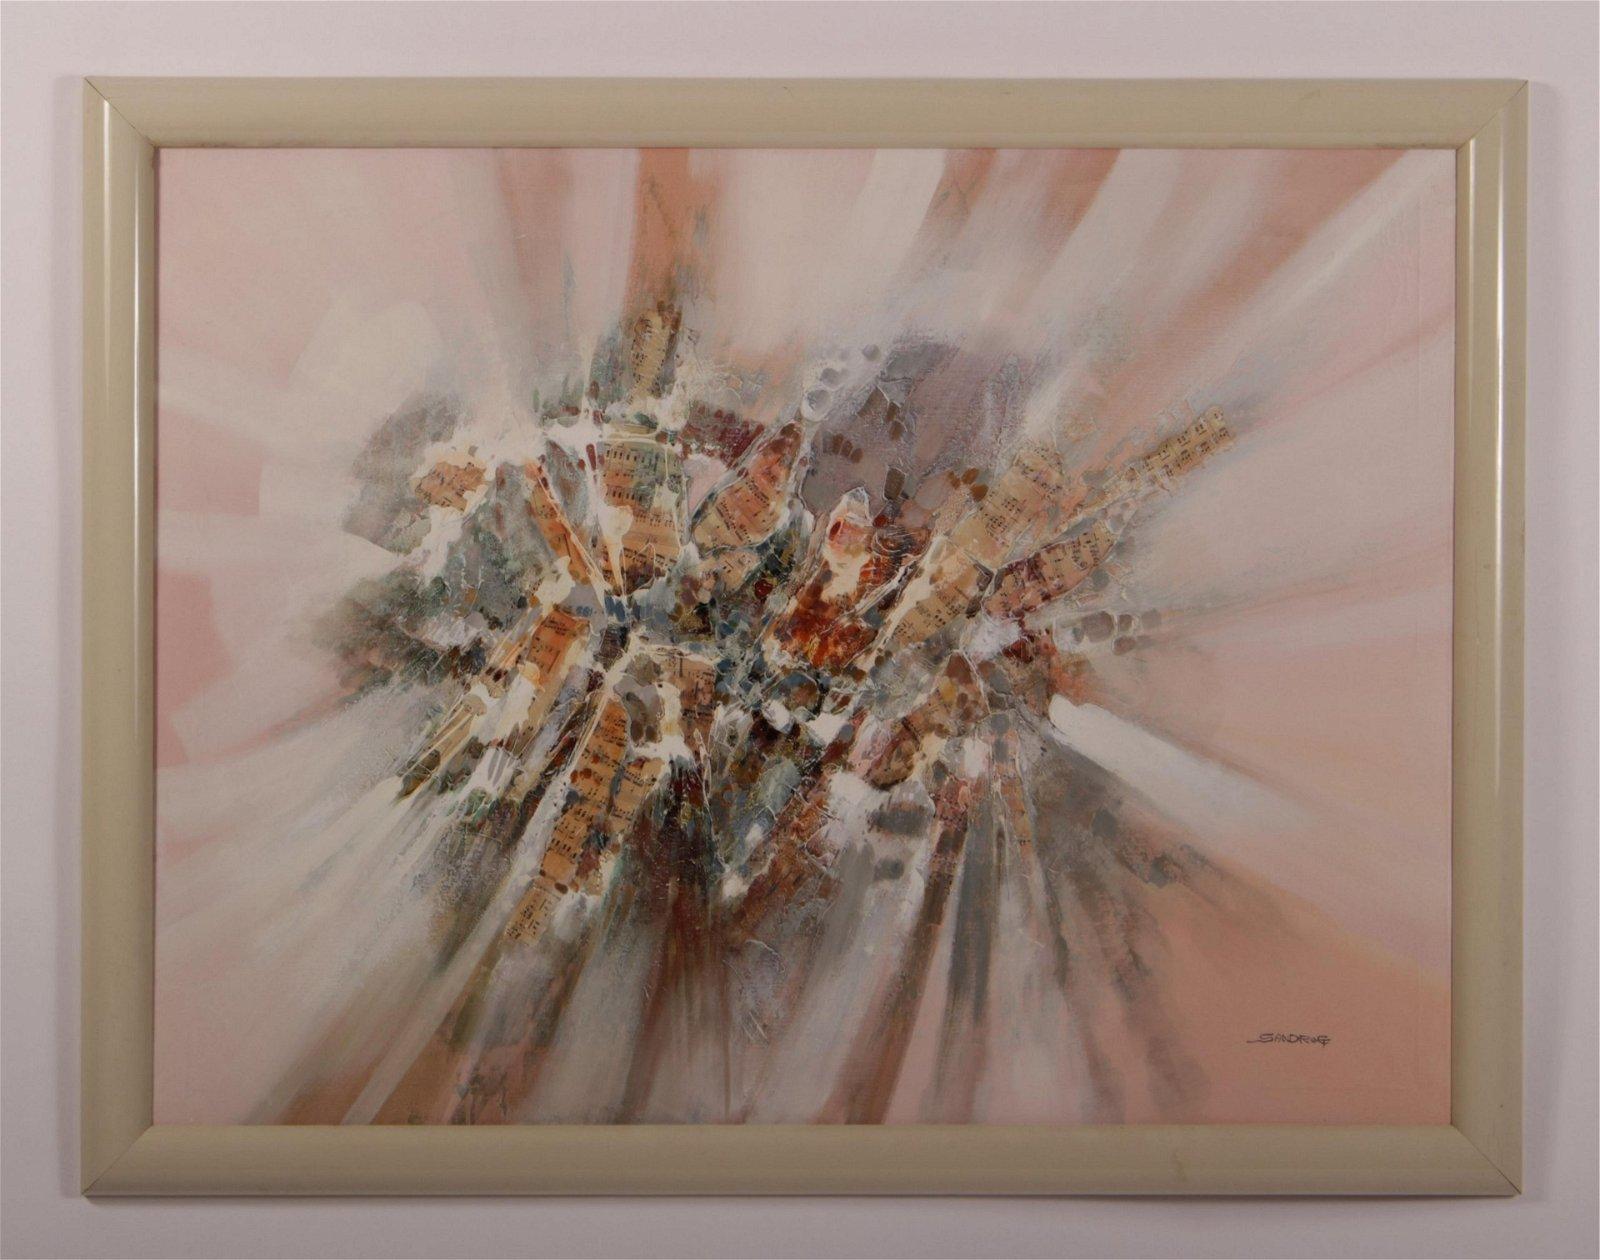 Sandrof 20th C. Abstract Modern Mixed Media